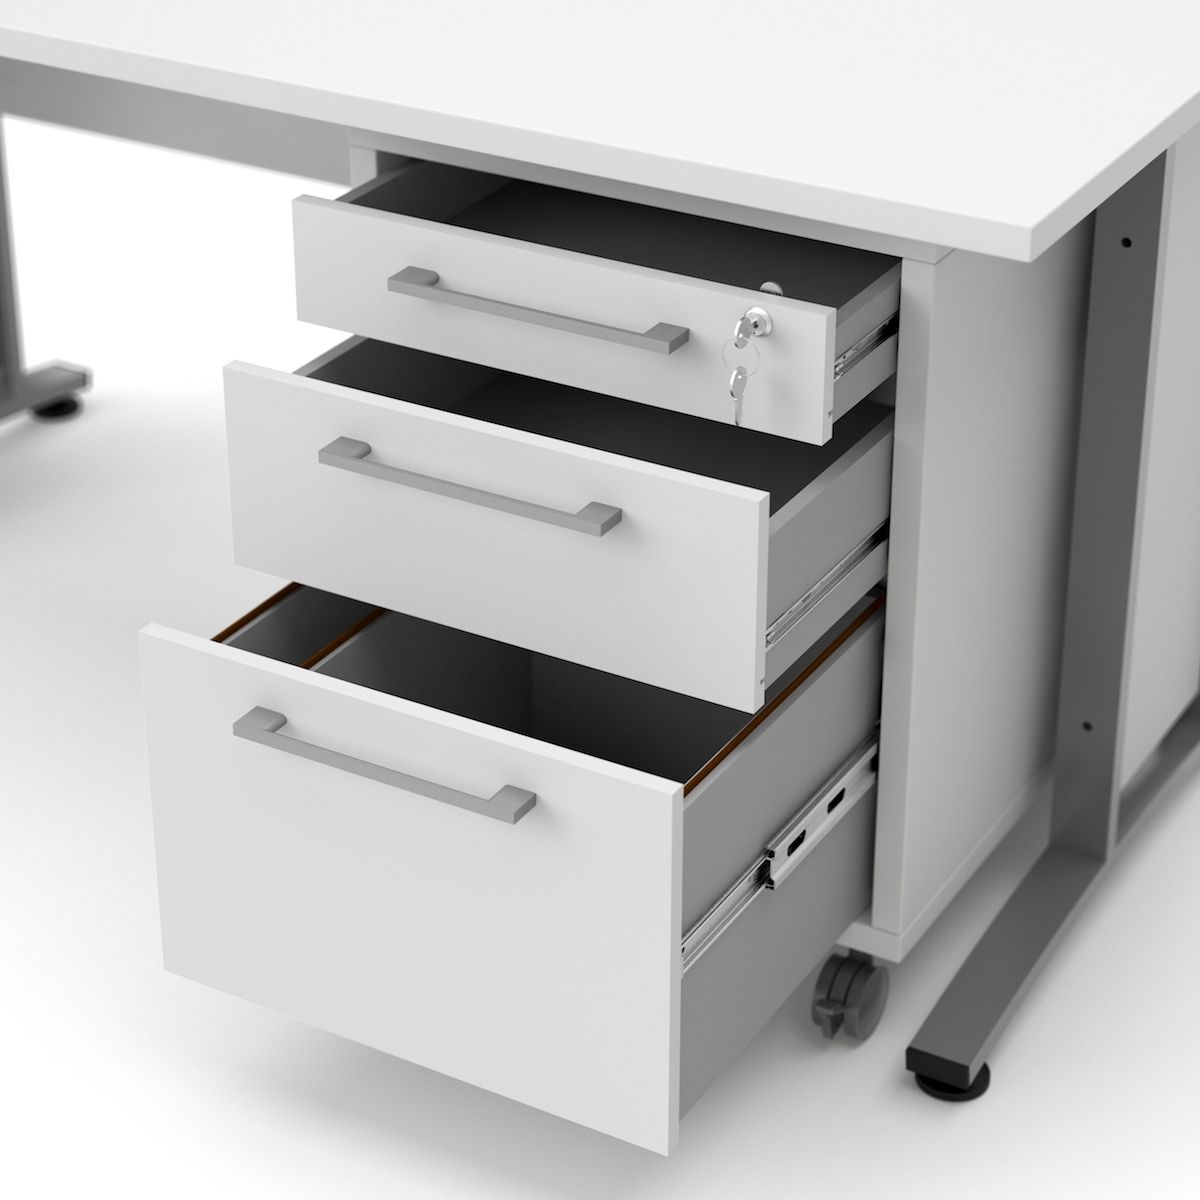 Prima Skrivebord - Hvid m/Skuffemodul - Skrivebord i hvid med et skuffemodul